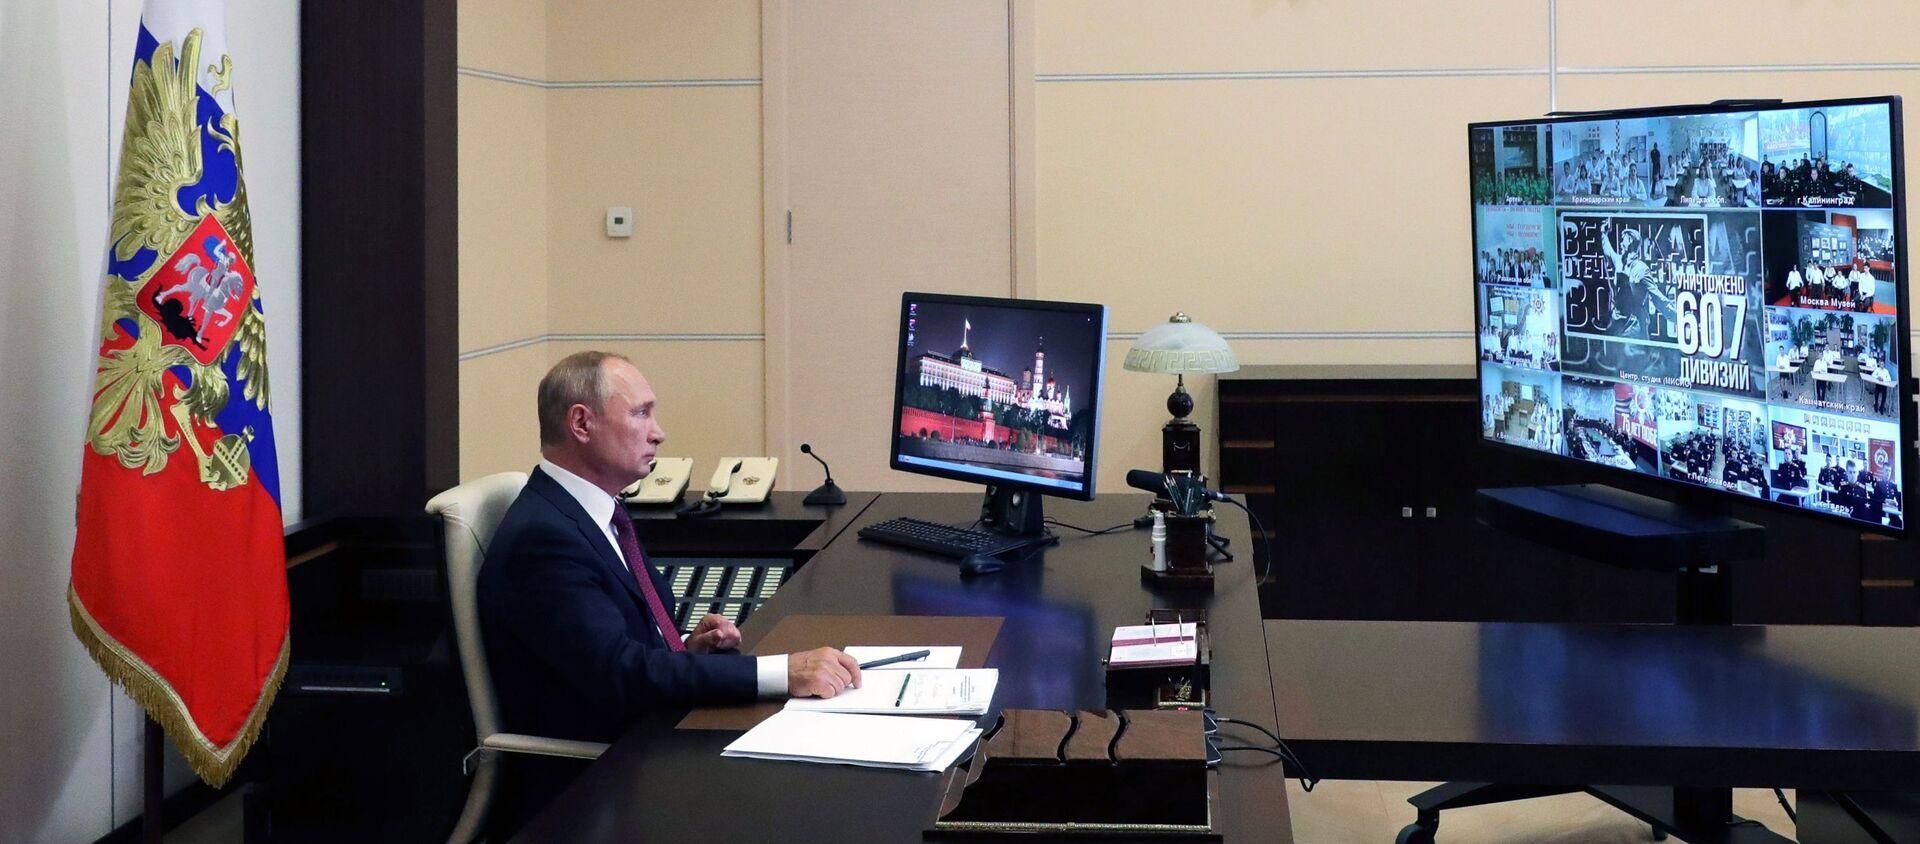 Putin durante una lezione aperta in videoconferenza - Sputnik Italia, 1920, 01.09.2020